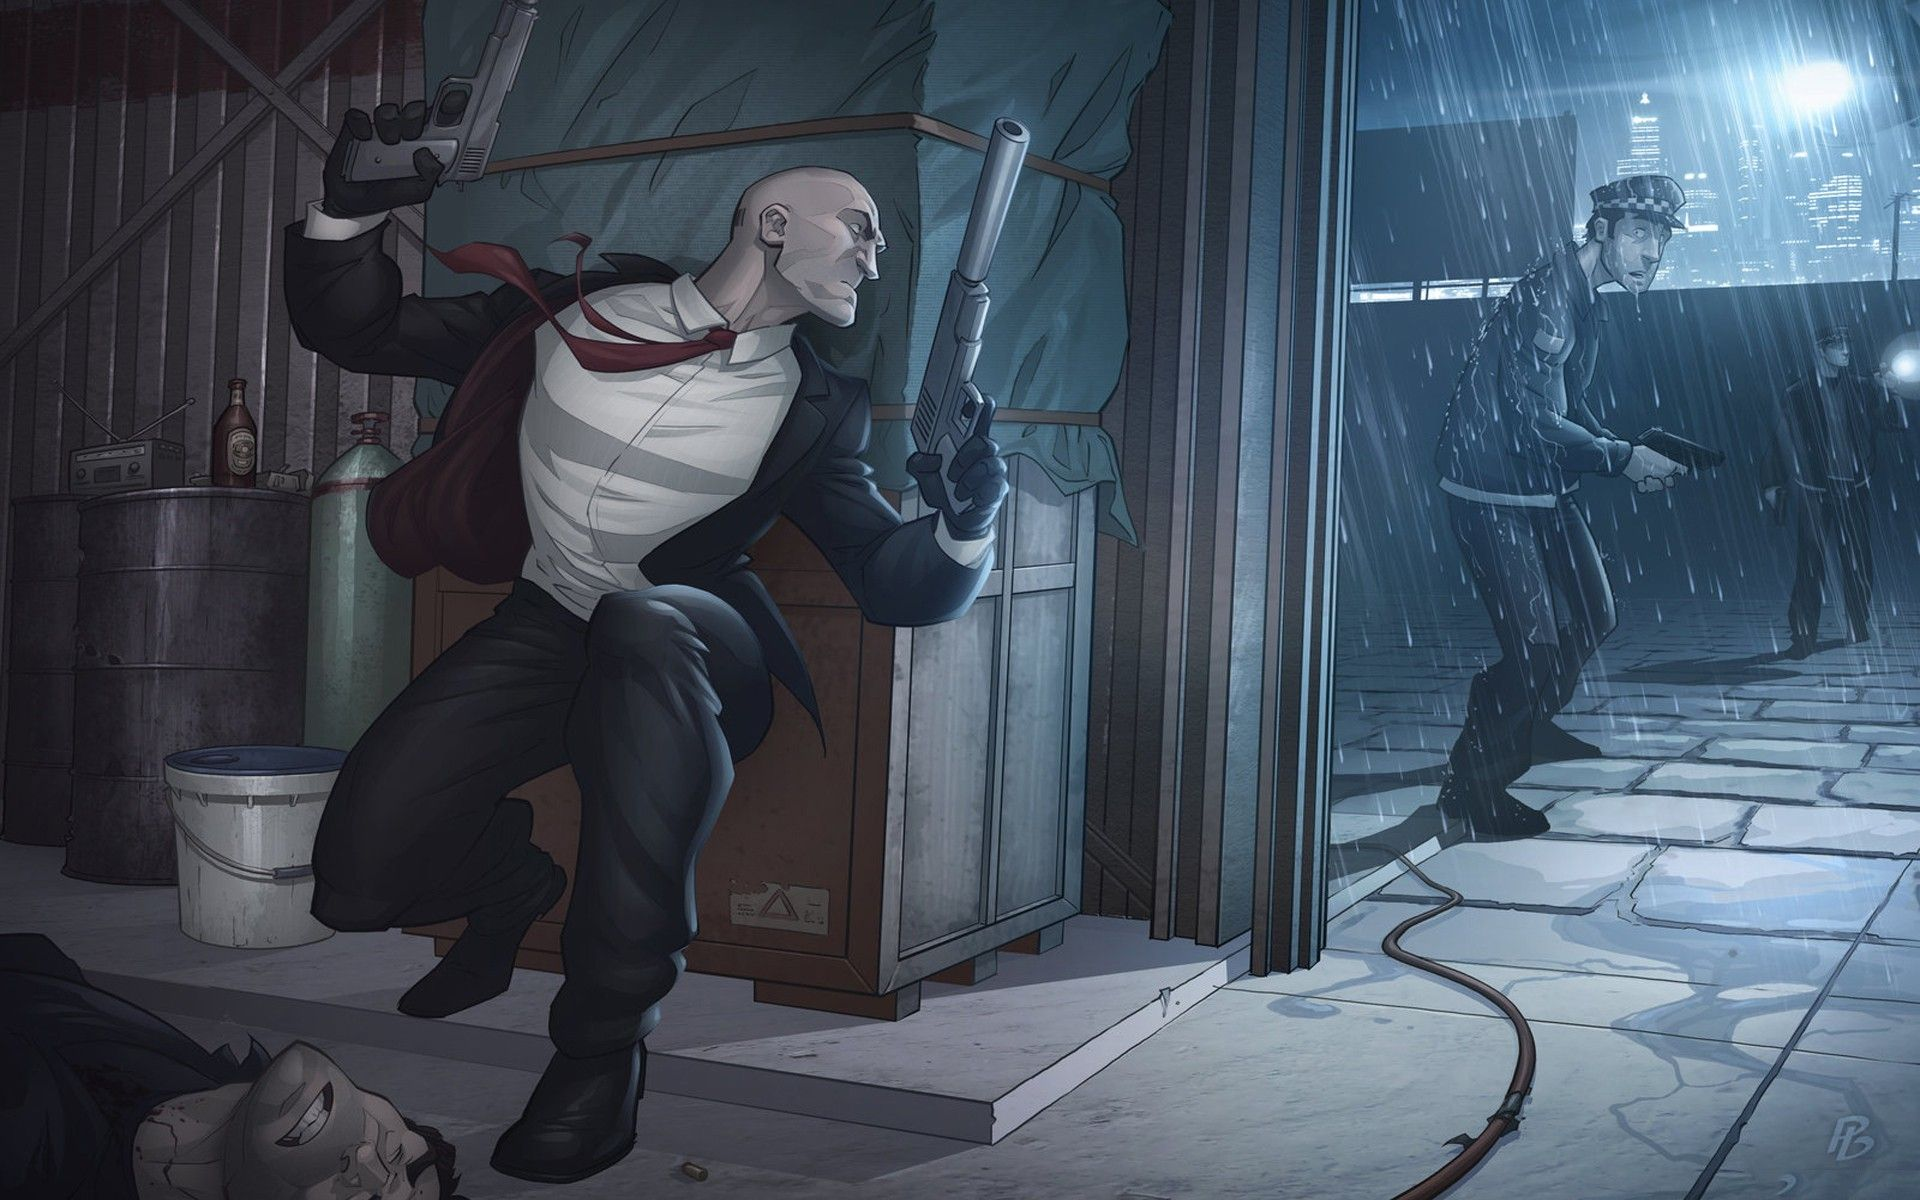 Agent 47 Artwork Assassins Cartoons Concept Art Guns Hitman Hitman Absolution Police Rain Video Games Wal Inspirational Digital Art Hitman Digital Illustration